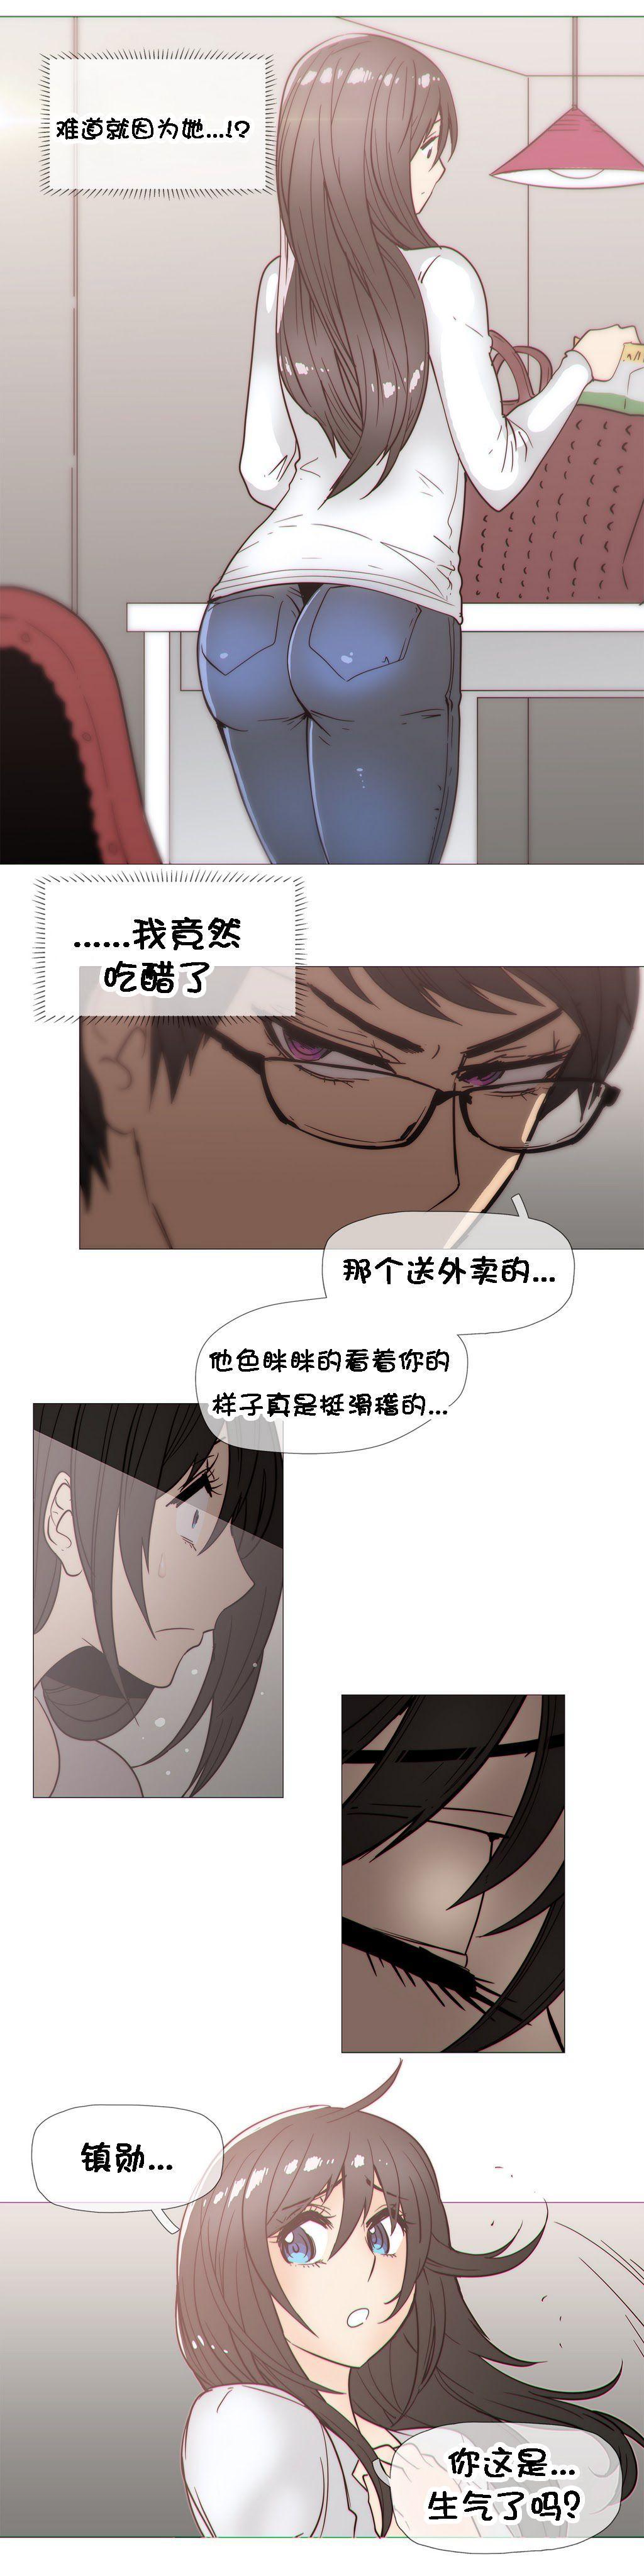 HouseHold Affairs 【卞赤鲤个人汉化】1~33话(持续更新中) 605